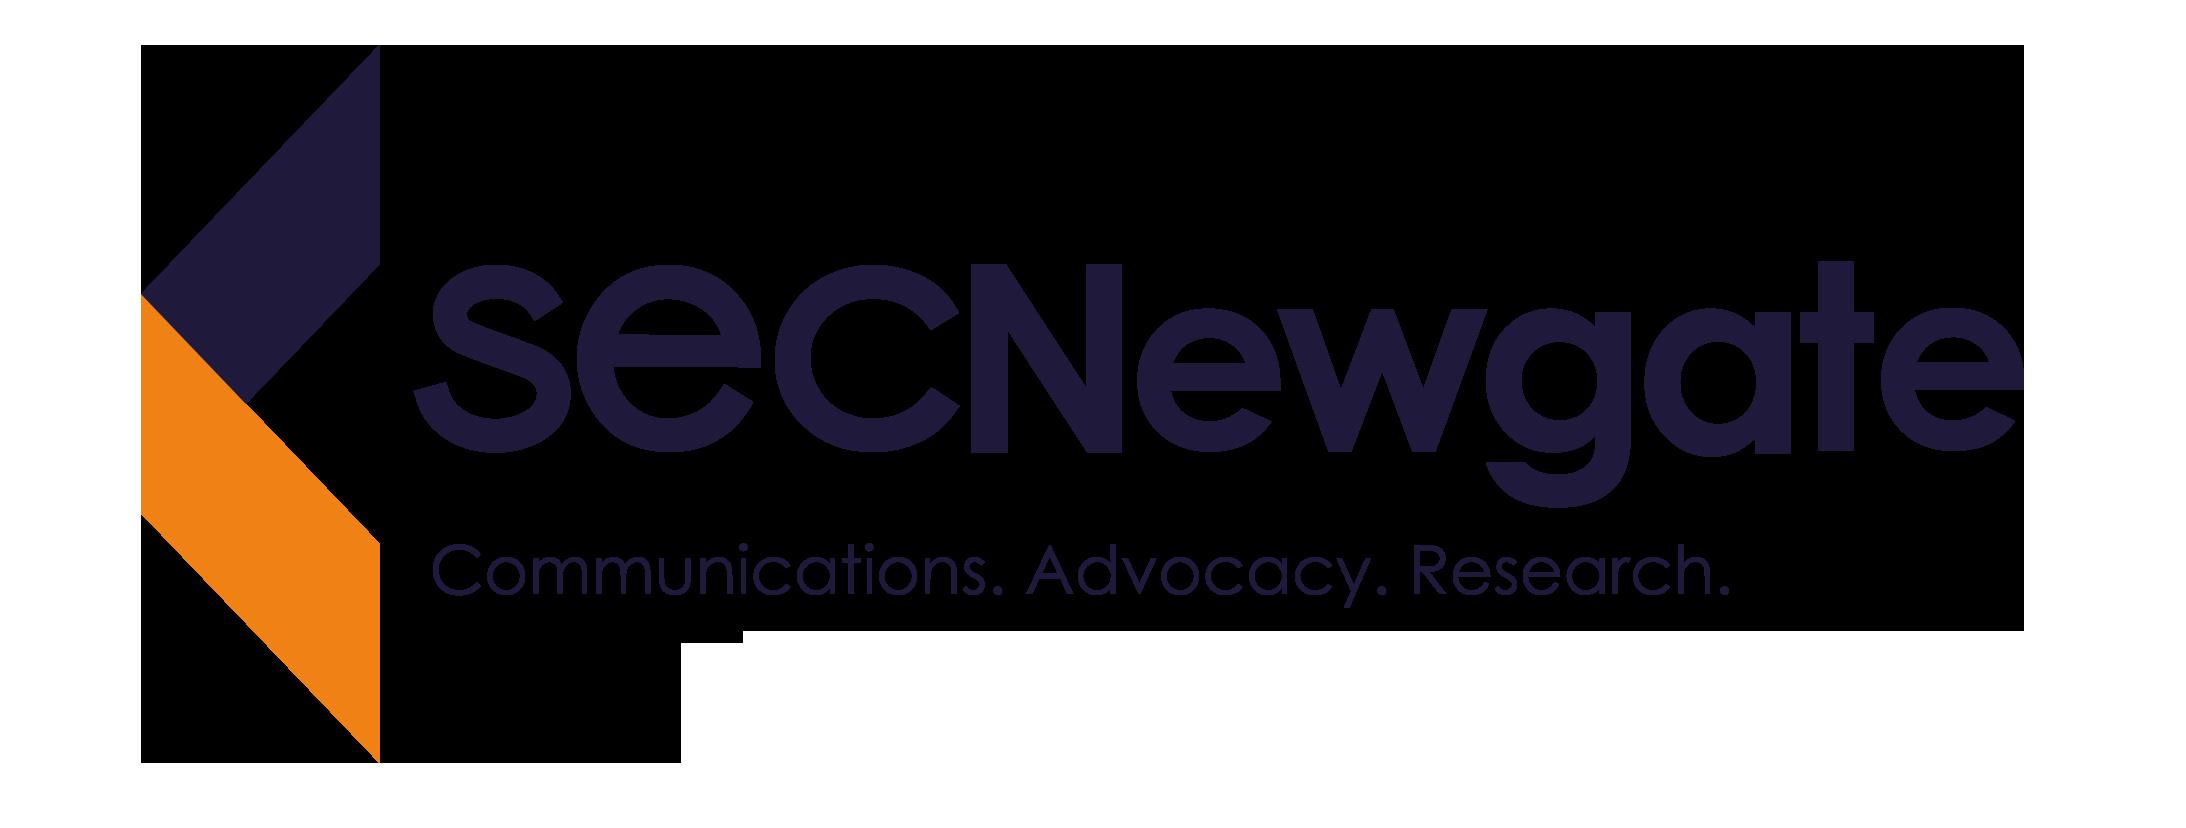 SEC NEWGATE S.P.A. Logo